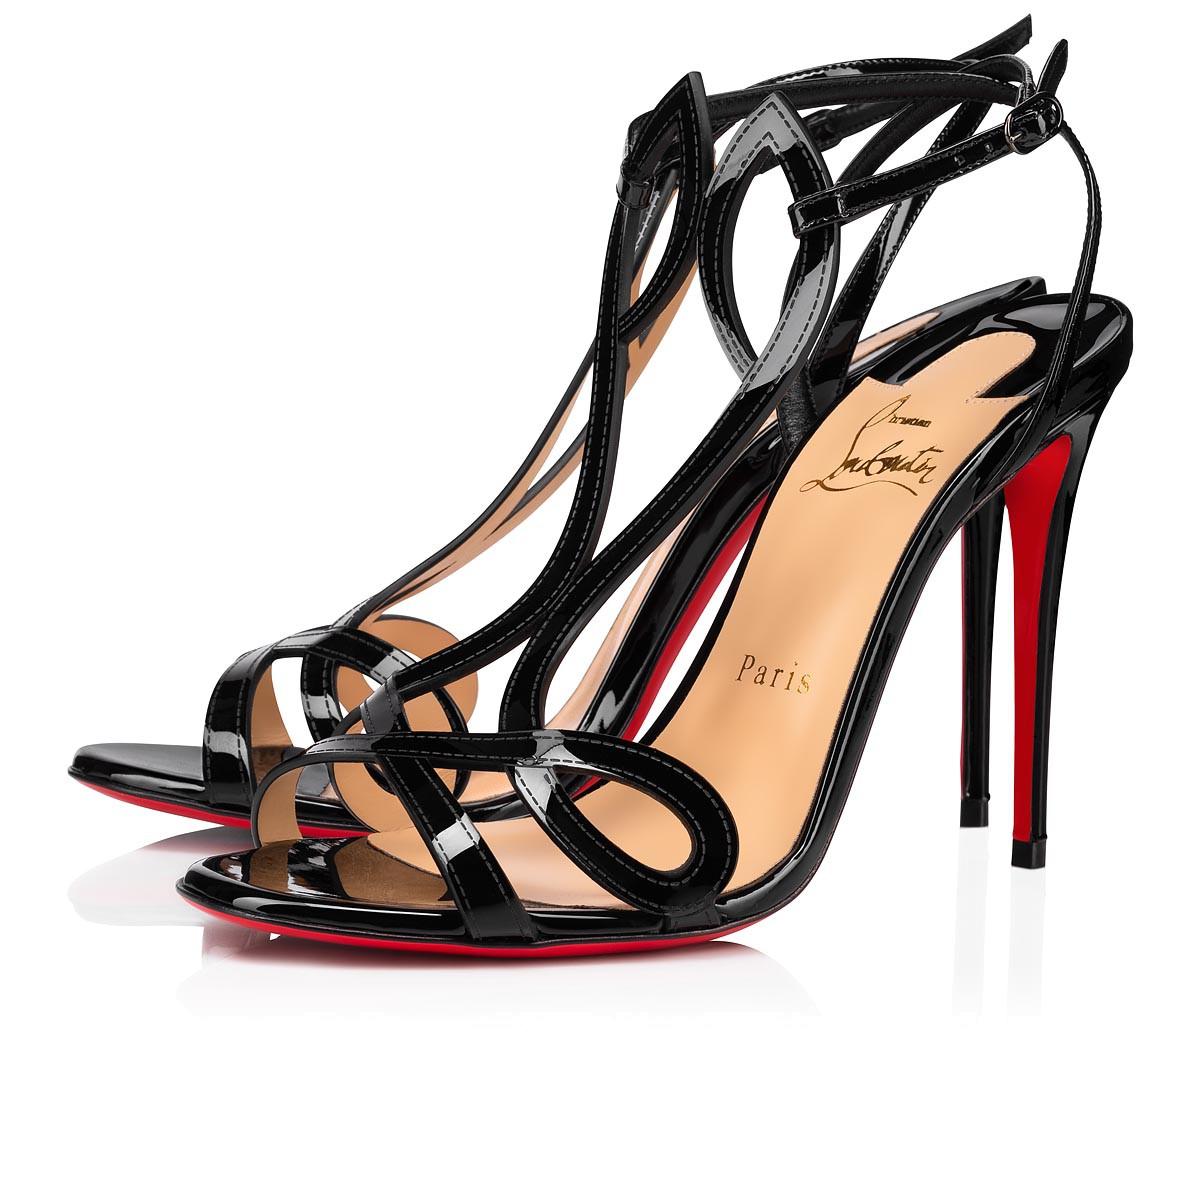 Shoes - Double L Sandal - Christian Louboutin